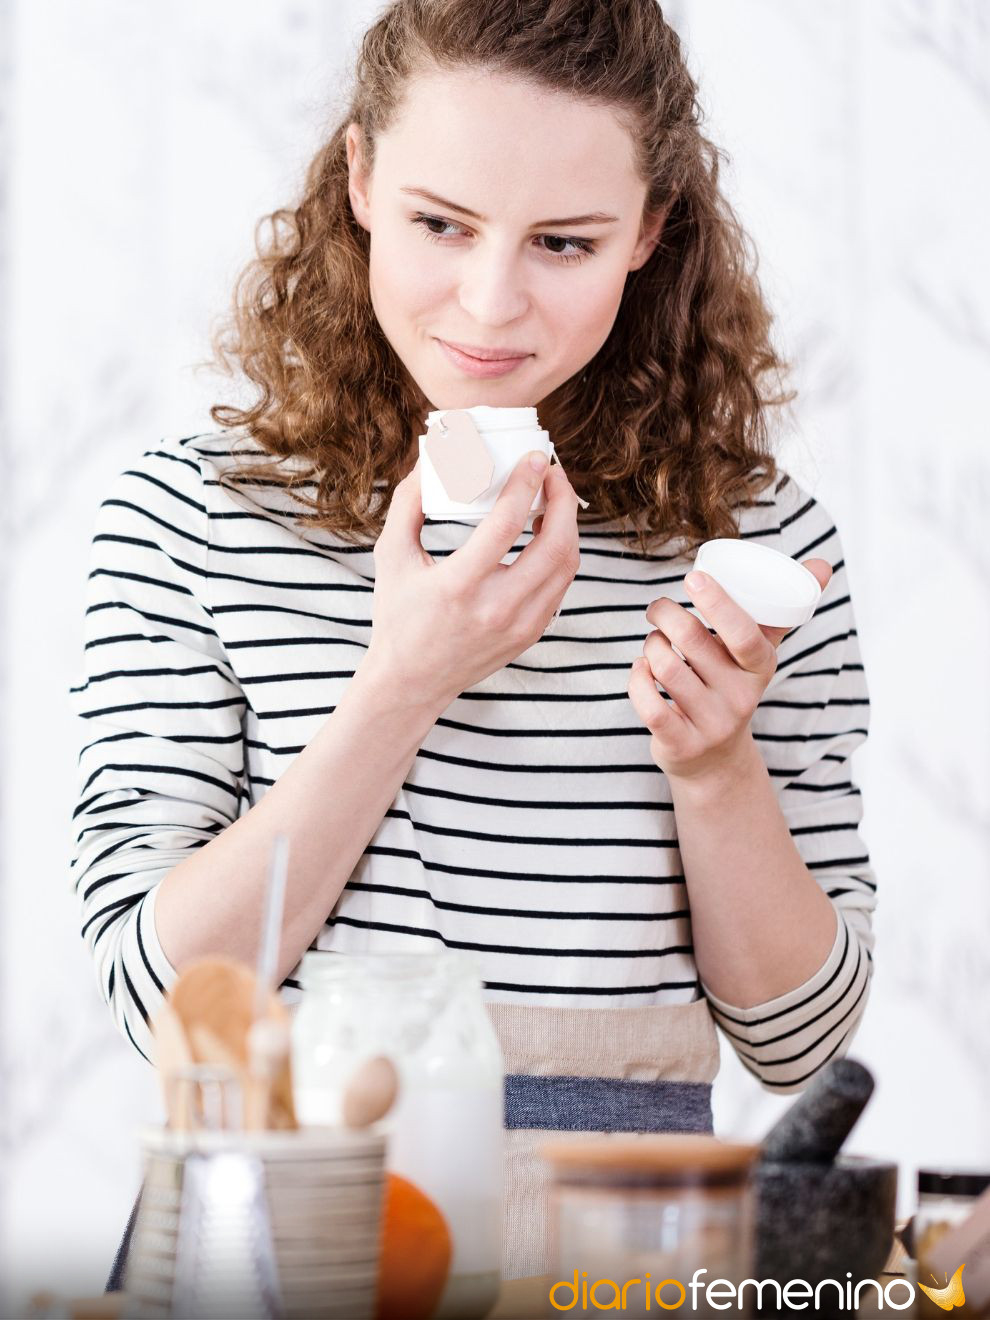 Higiene íntima: siempre utiliza jabón neutro